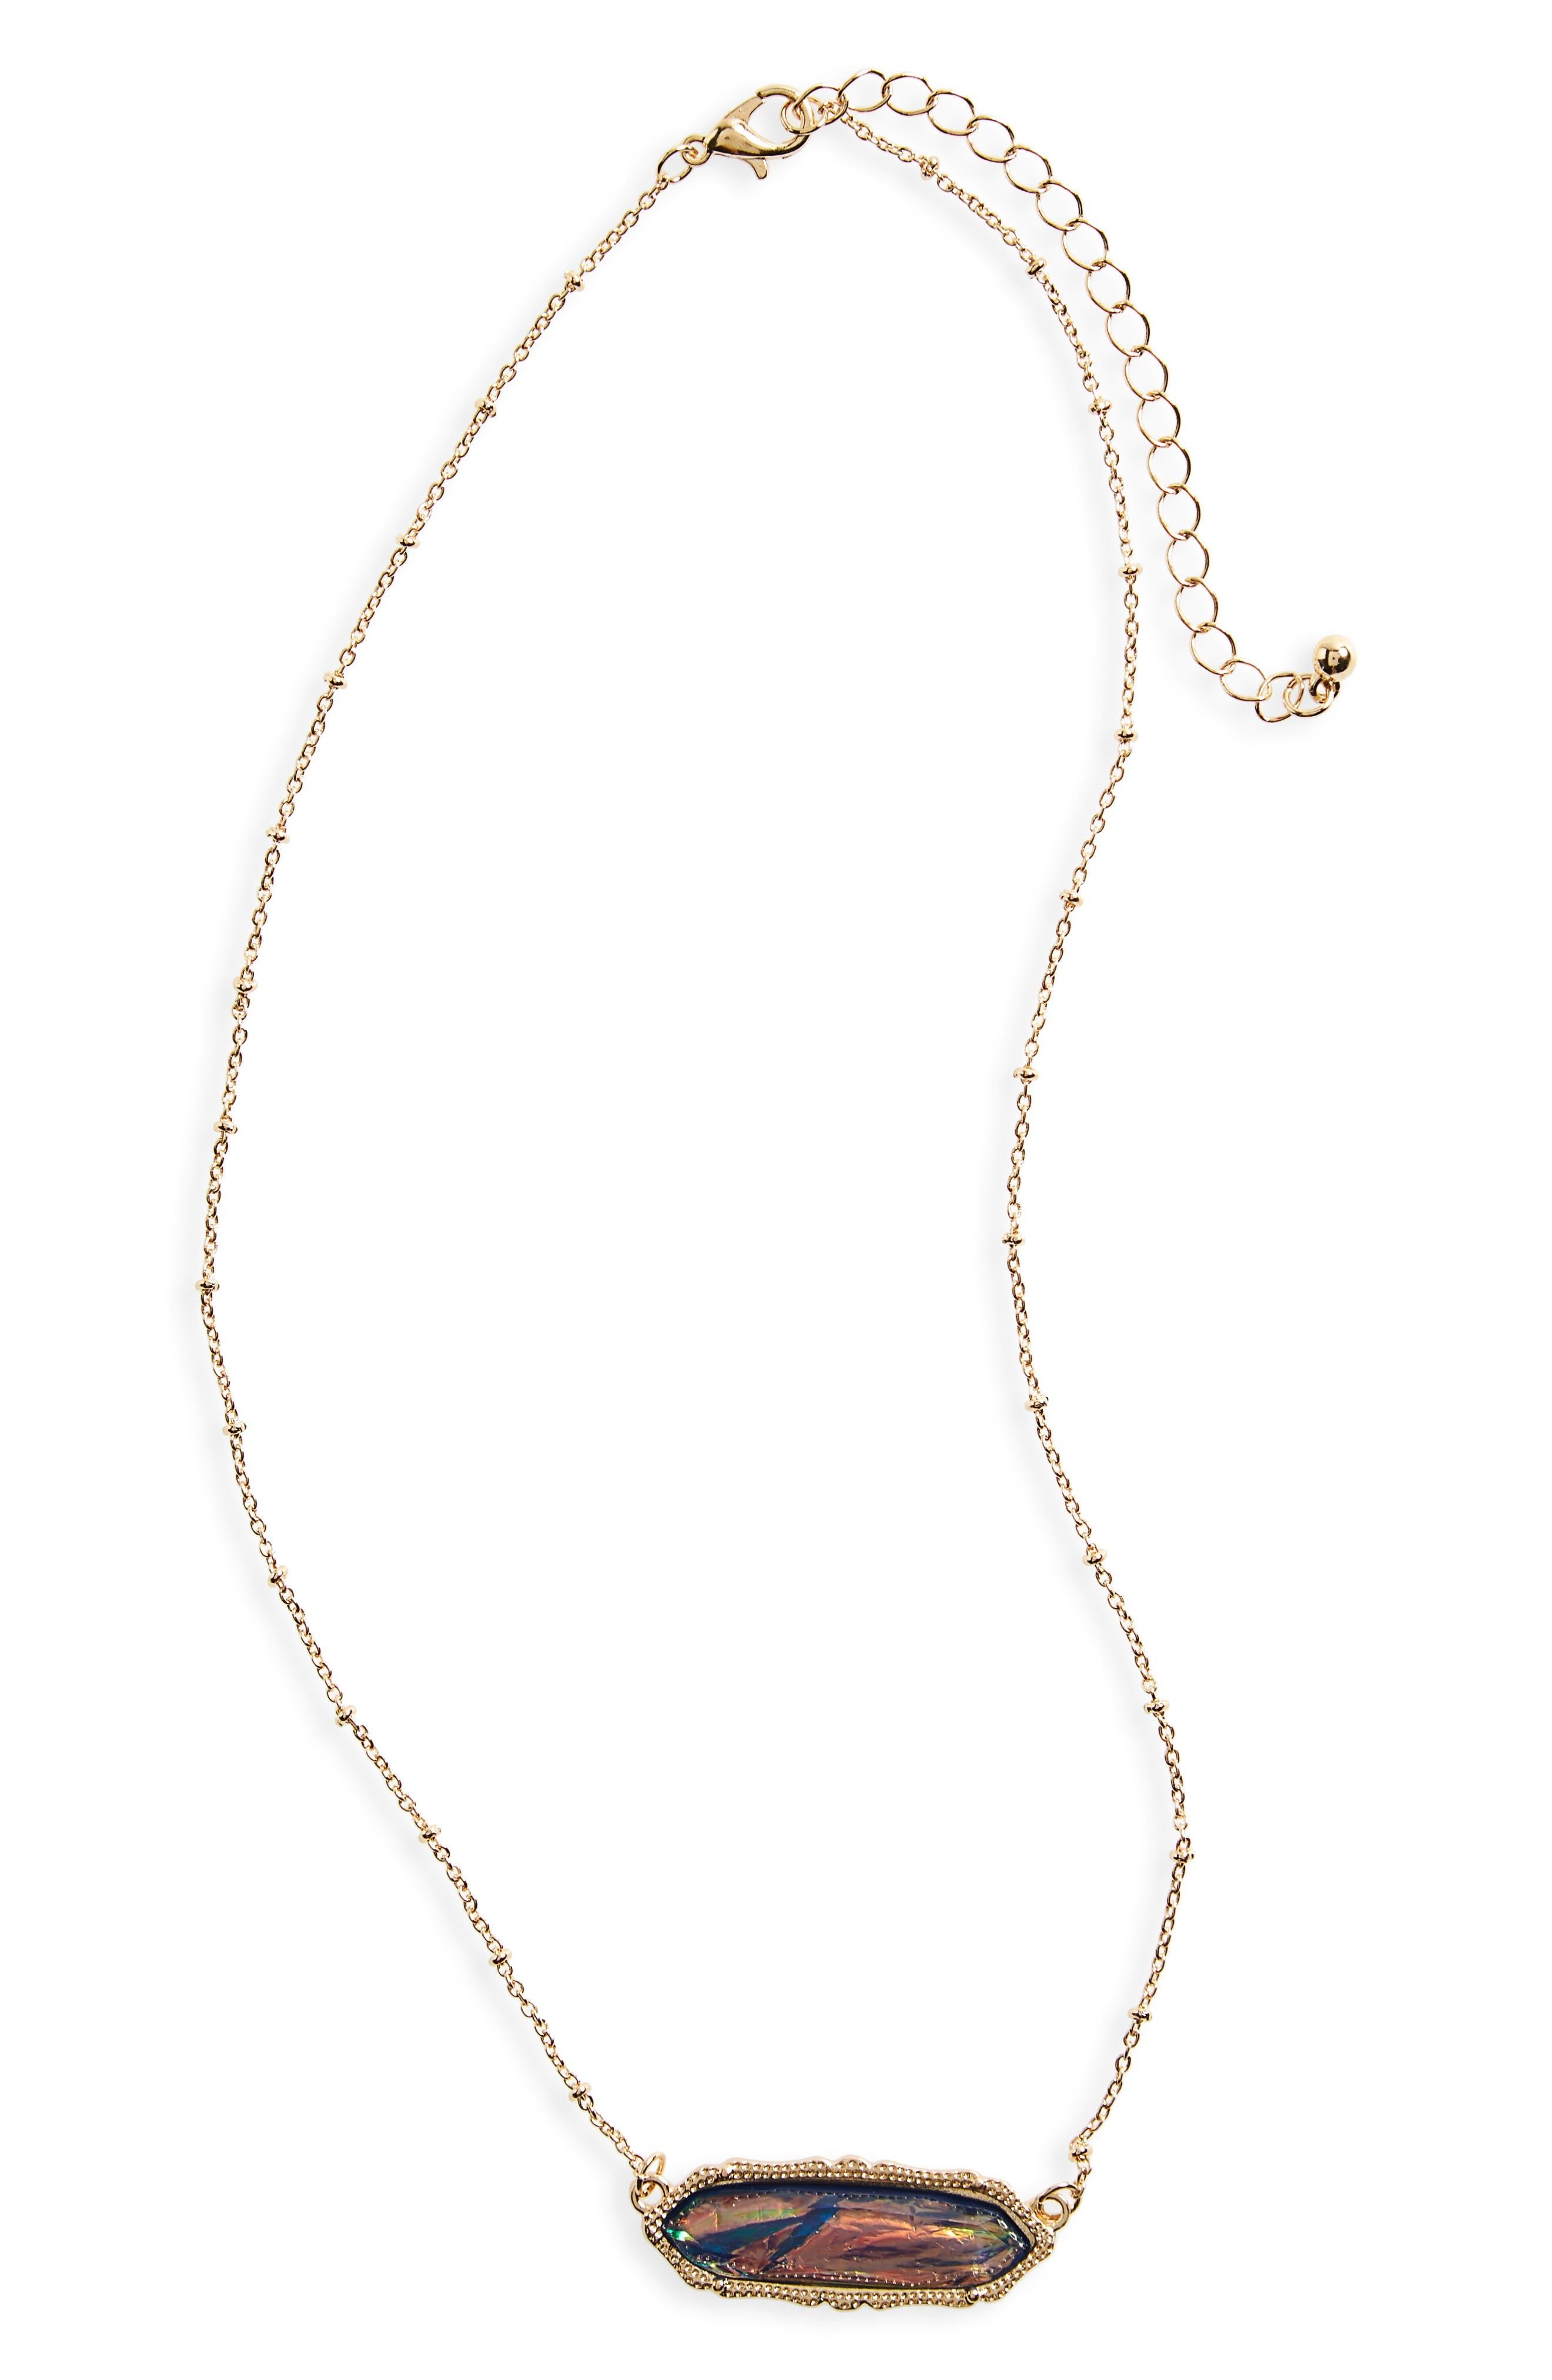 Stone Charm Necklace,                             Main thumbnail 1, color,                             710